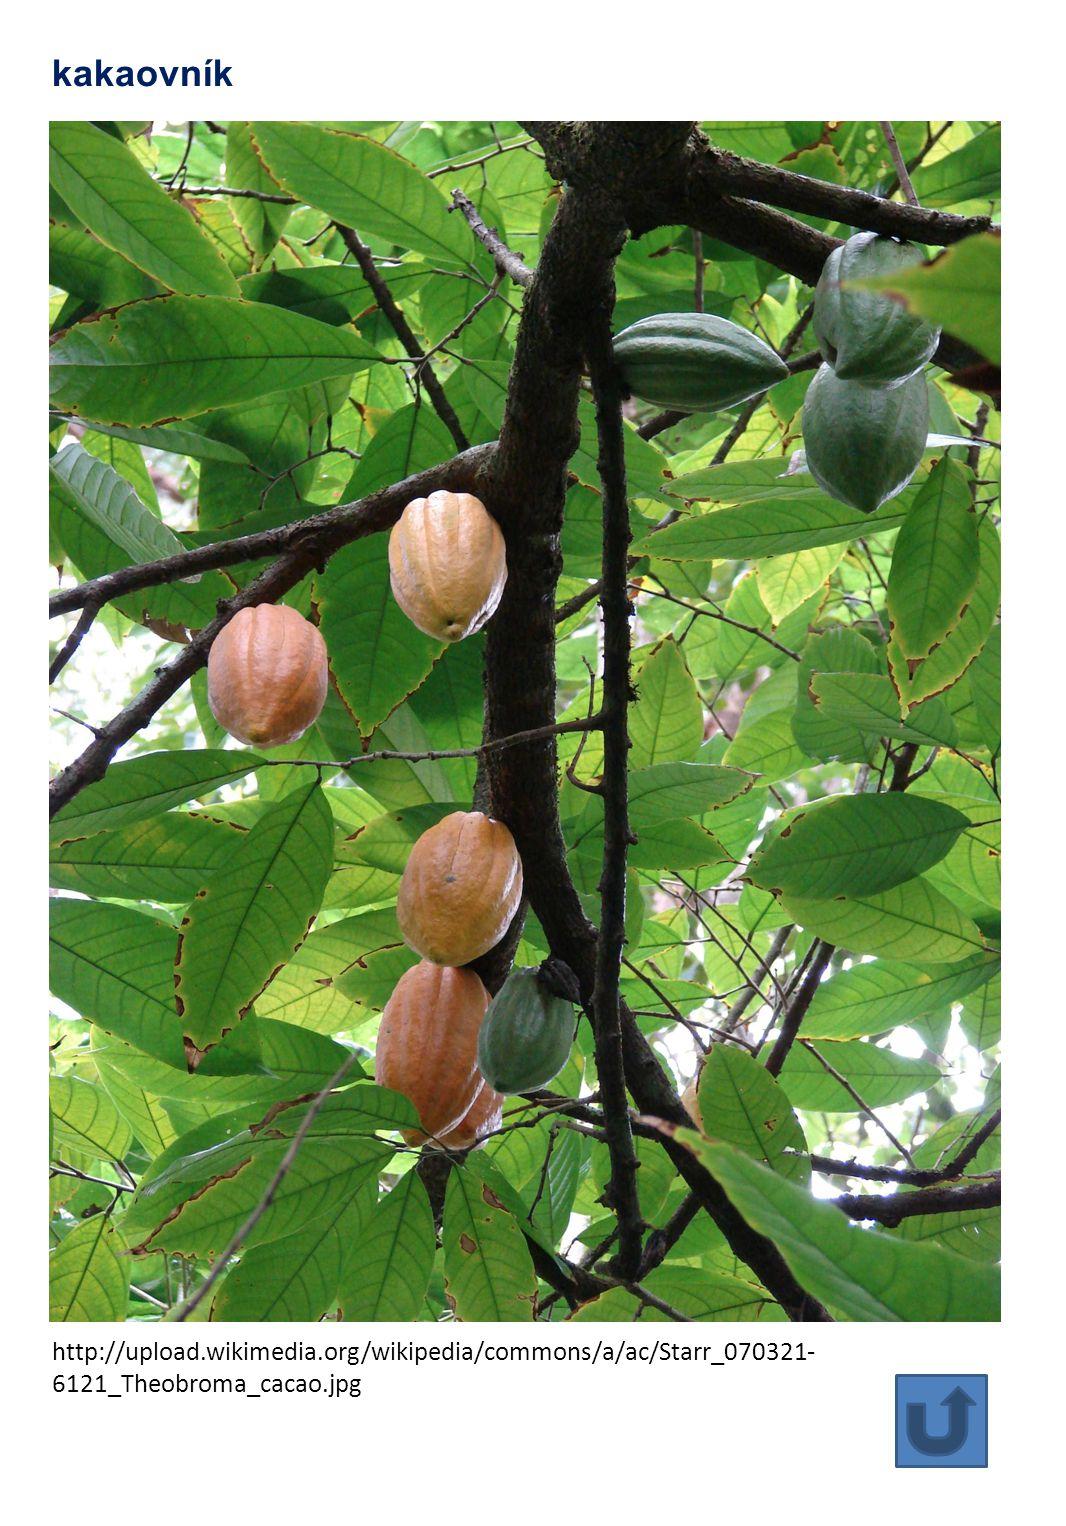 http://upload.wikimedia.org/wikipedia/commons/a/ac/Starr_070321- 6121_Theobroma_cacao.jpg kakaovník